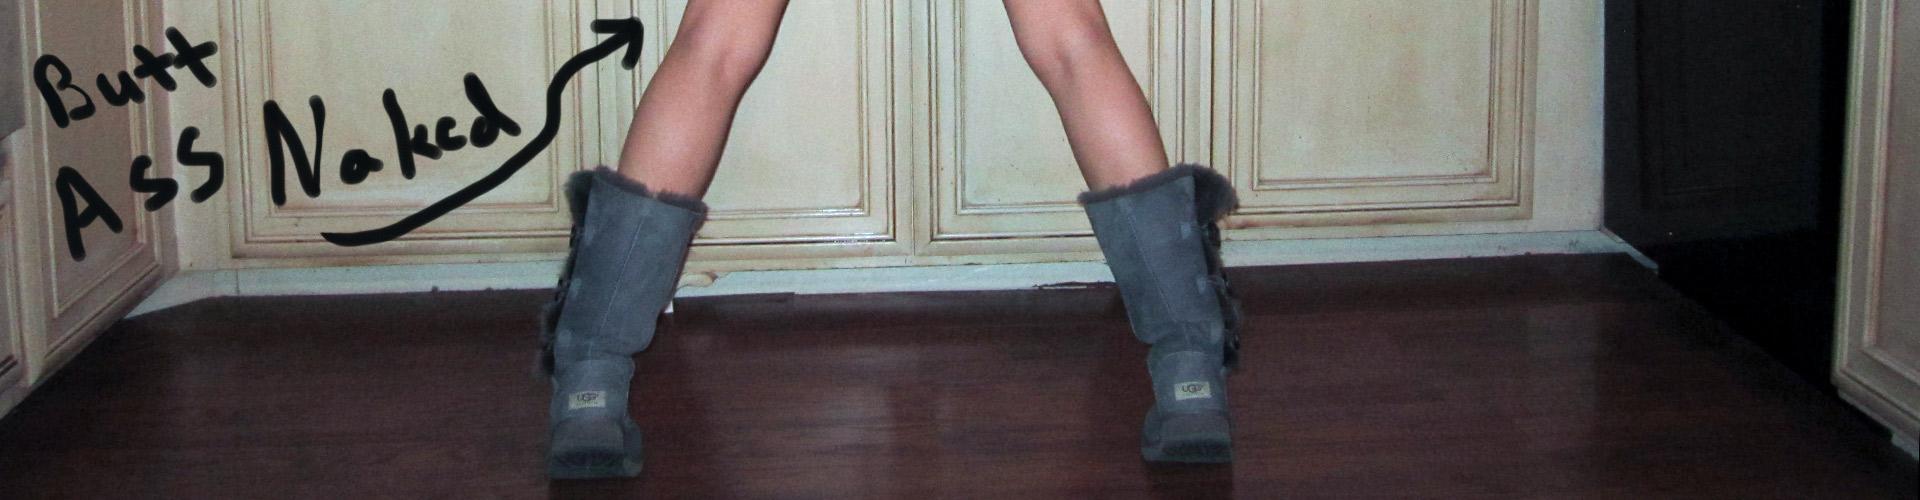 Dawn wearing Ugg boots